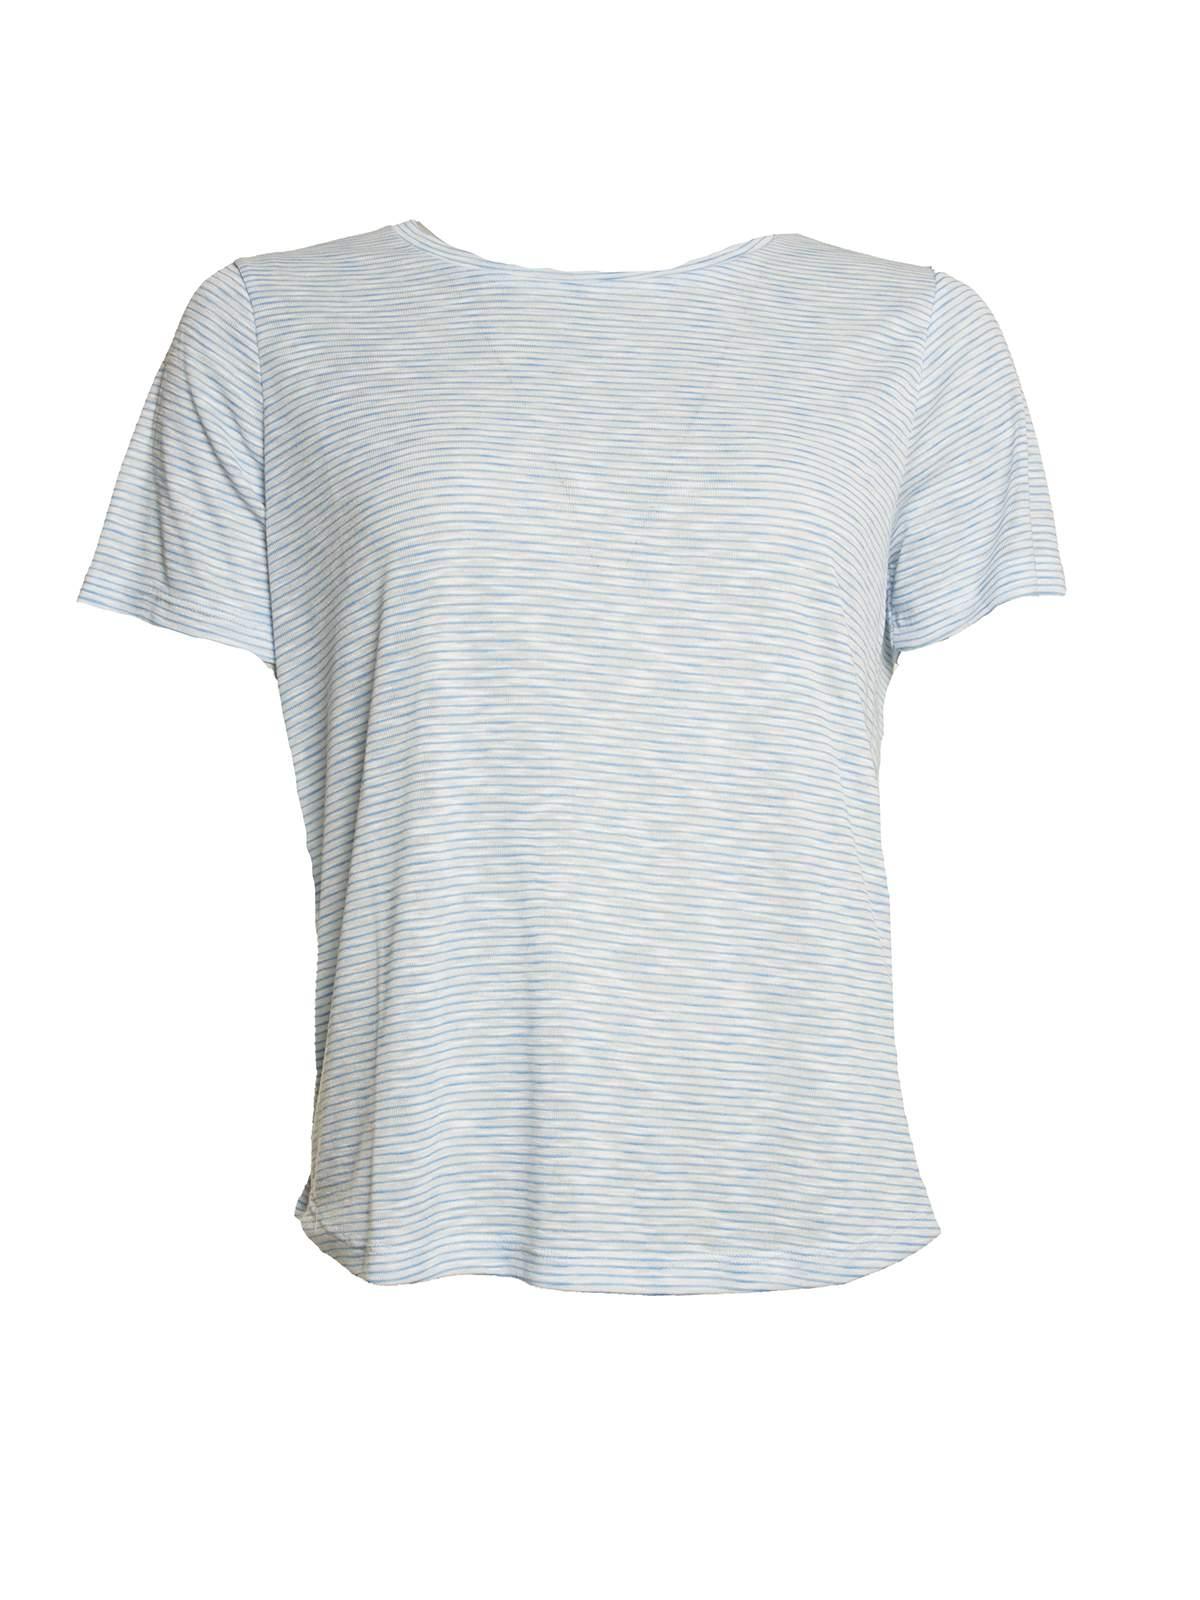 c96321fc3 Zebra T-shirt - Katie Kerr - Women's Clothing - UK